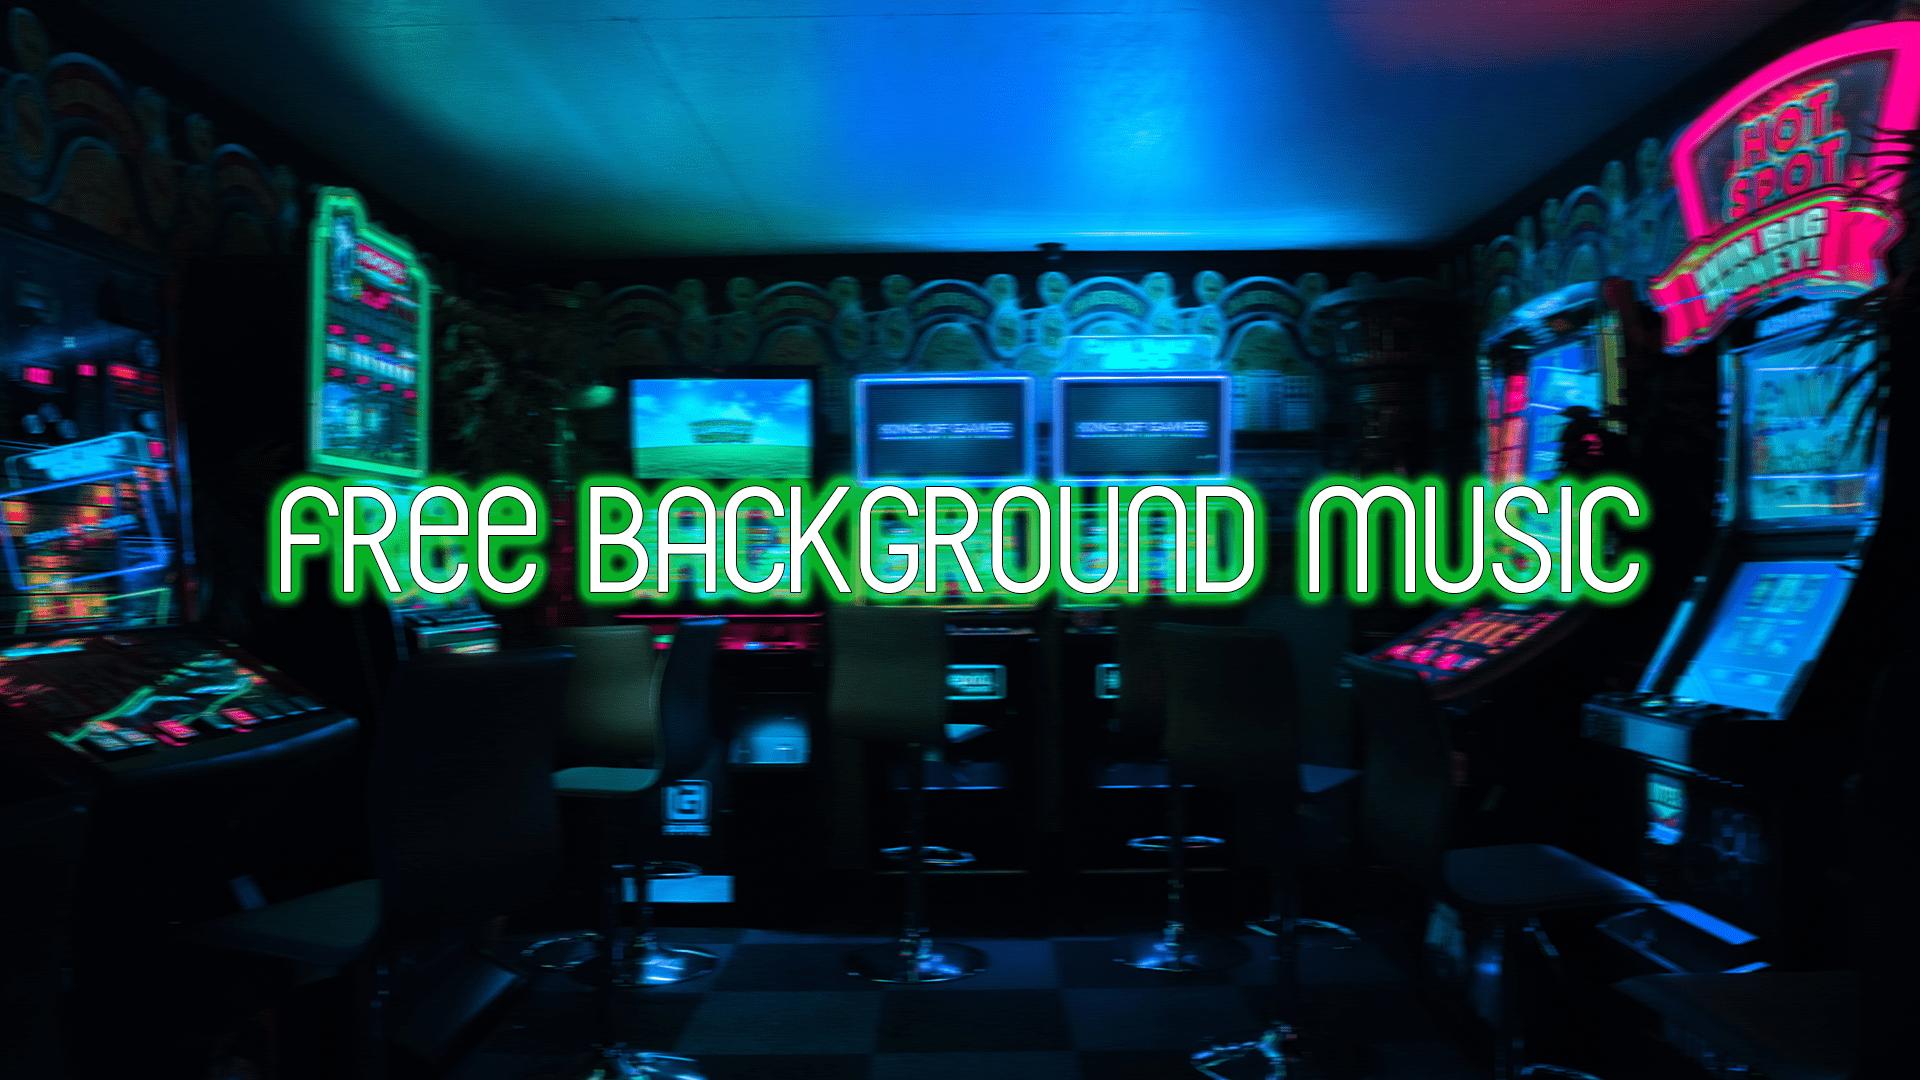 Free gaming background music | free background music